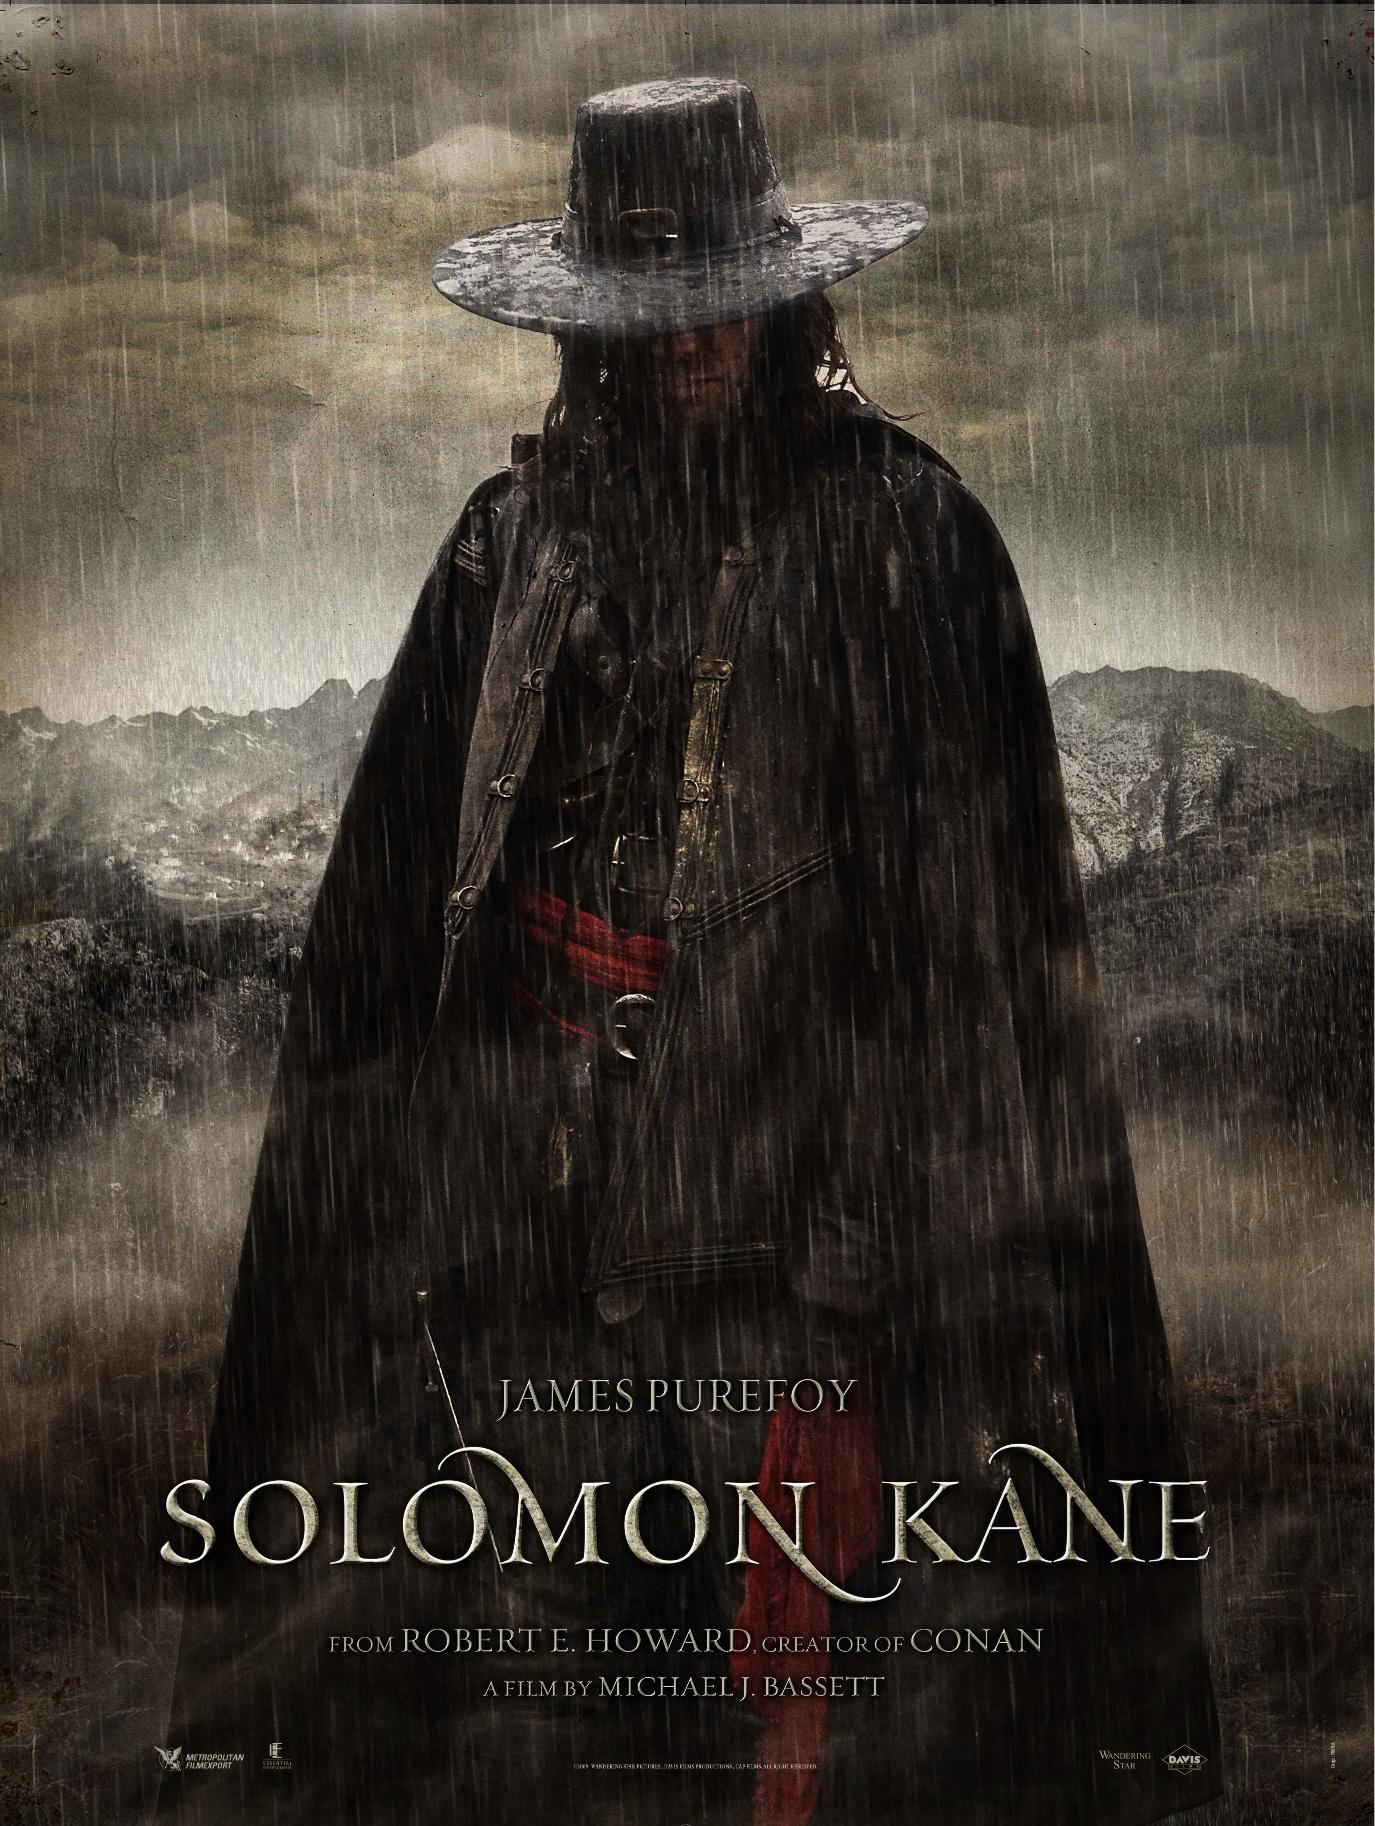 Solomon Kane Van Helsing 2 Correction Screenphiles